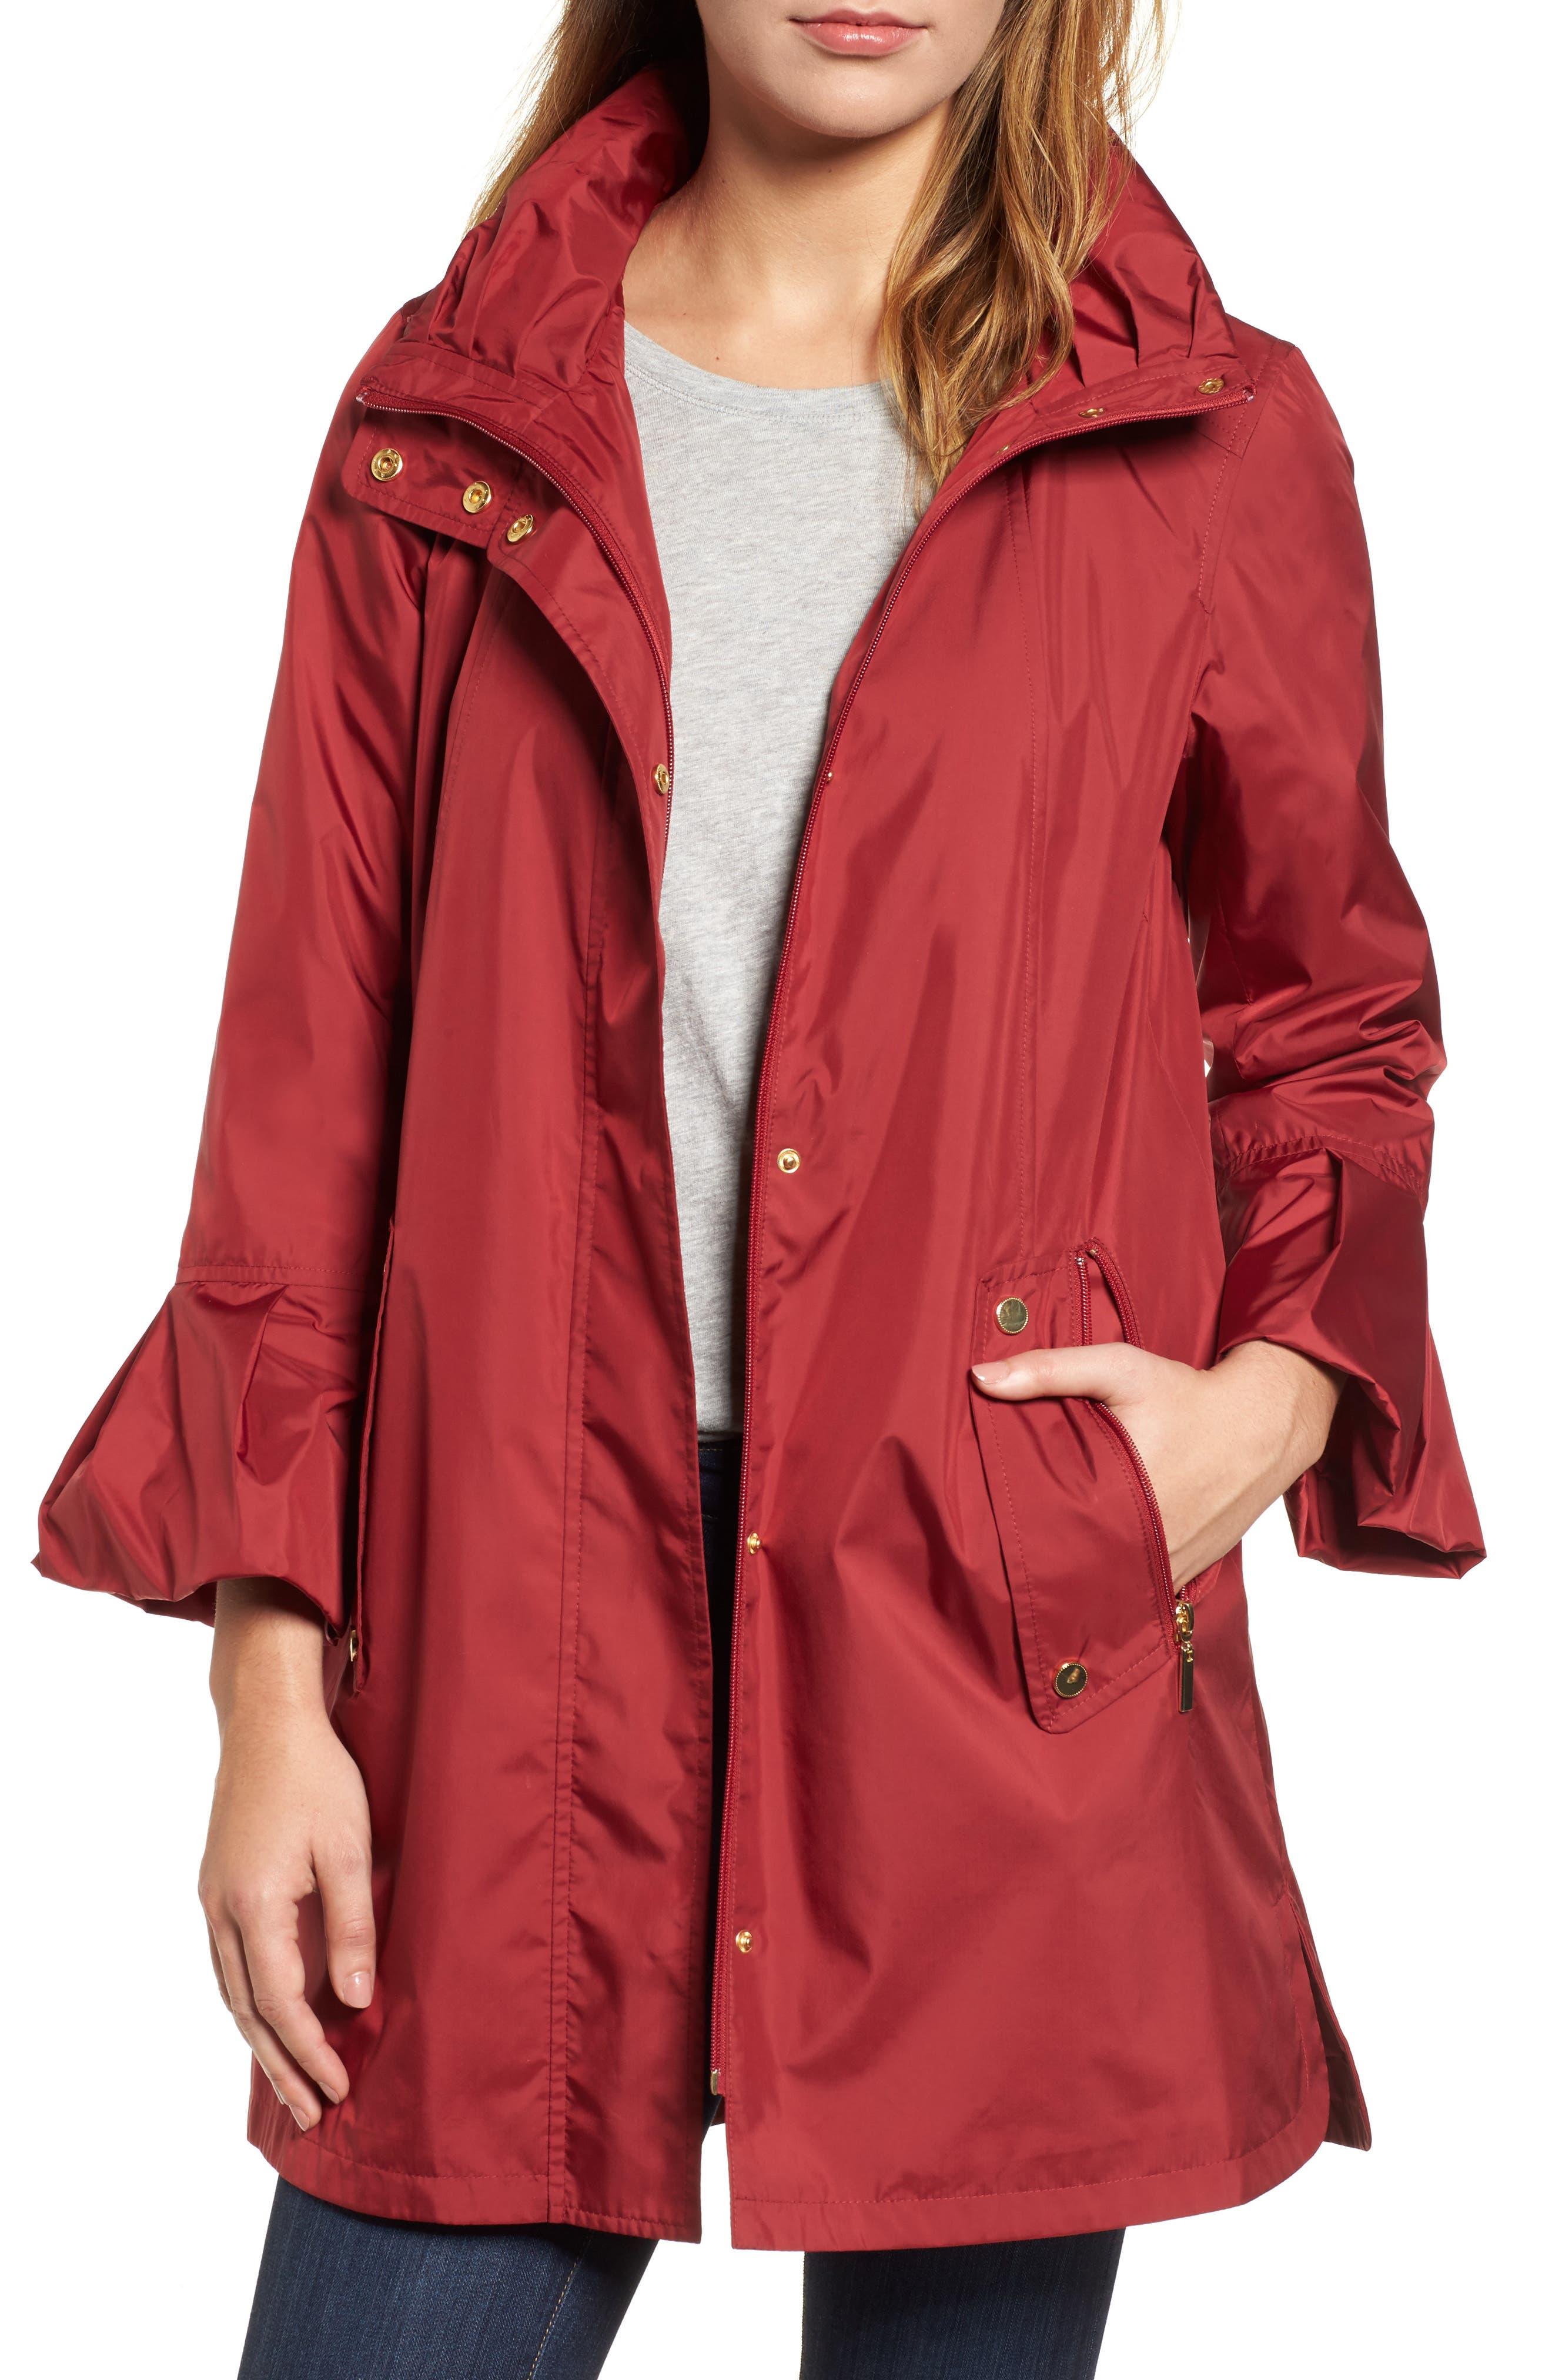 Flare Sleeve Packable Swing Jacket,                         Main,                         color, Garnet